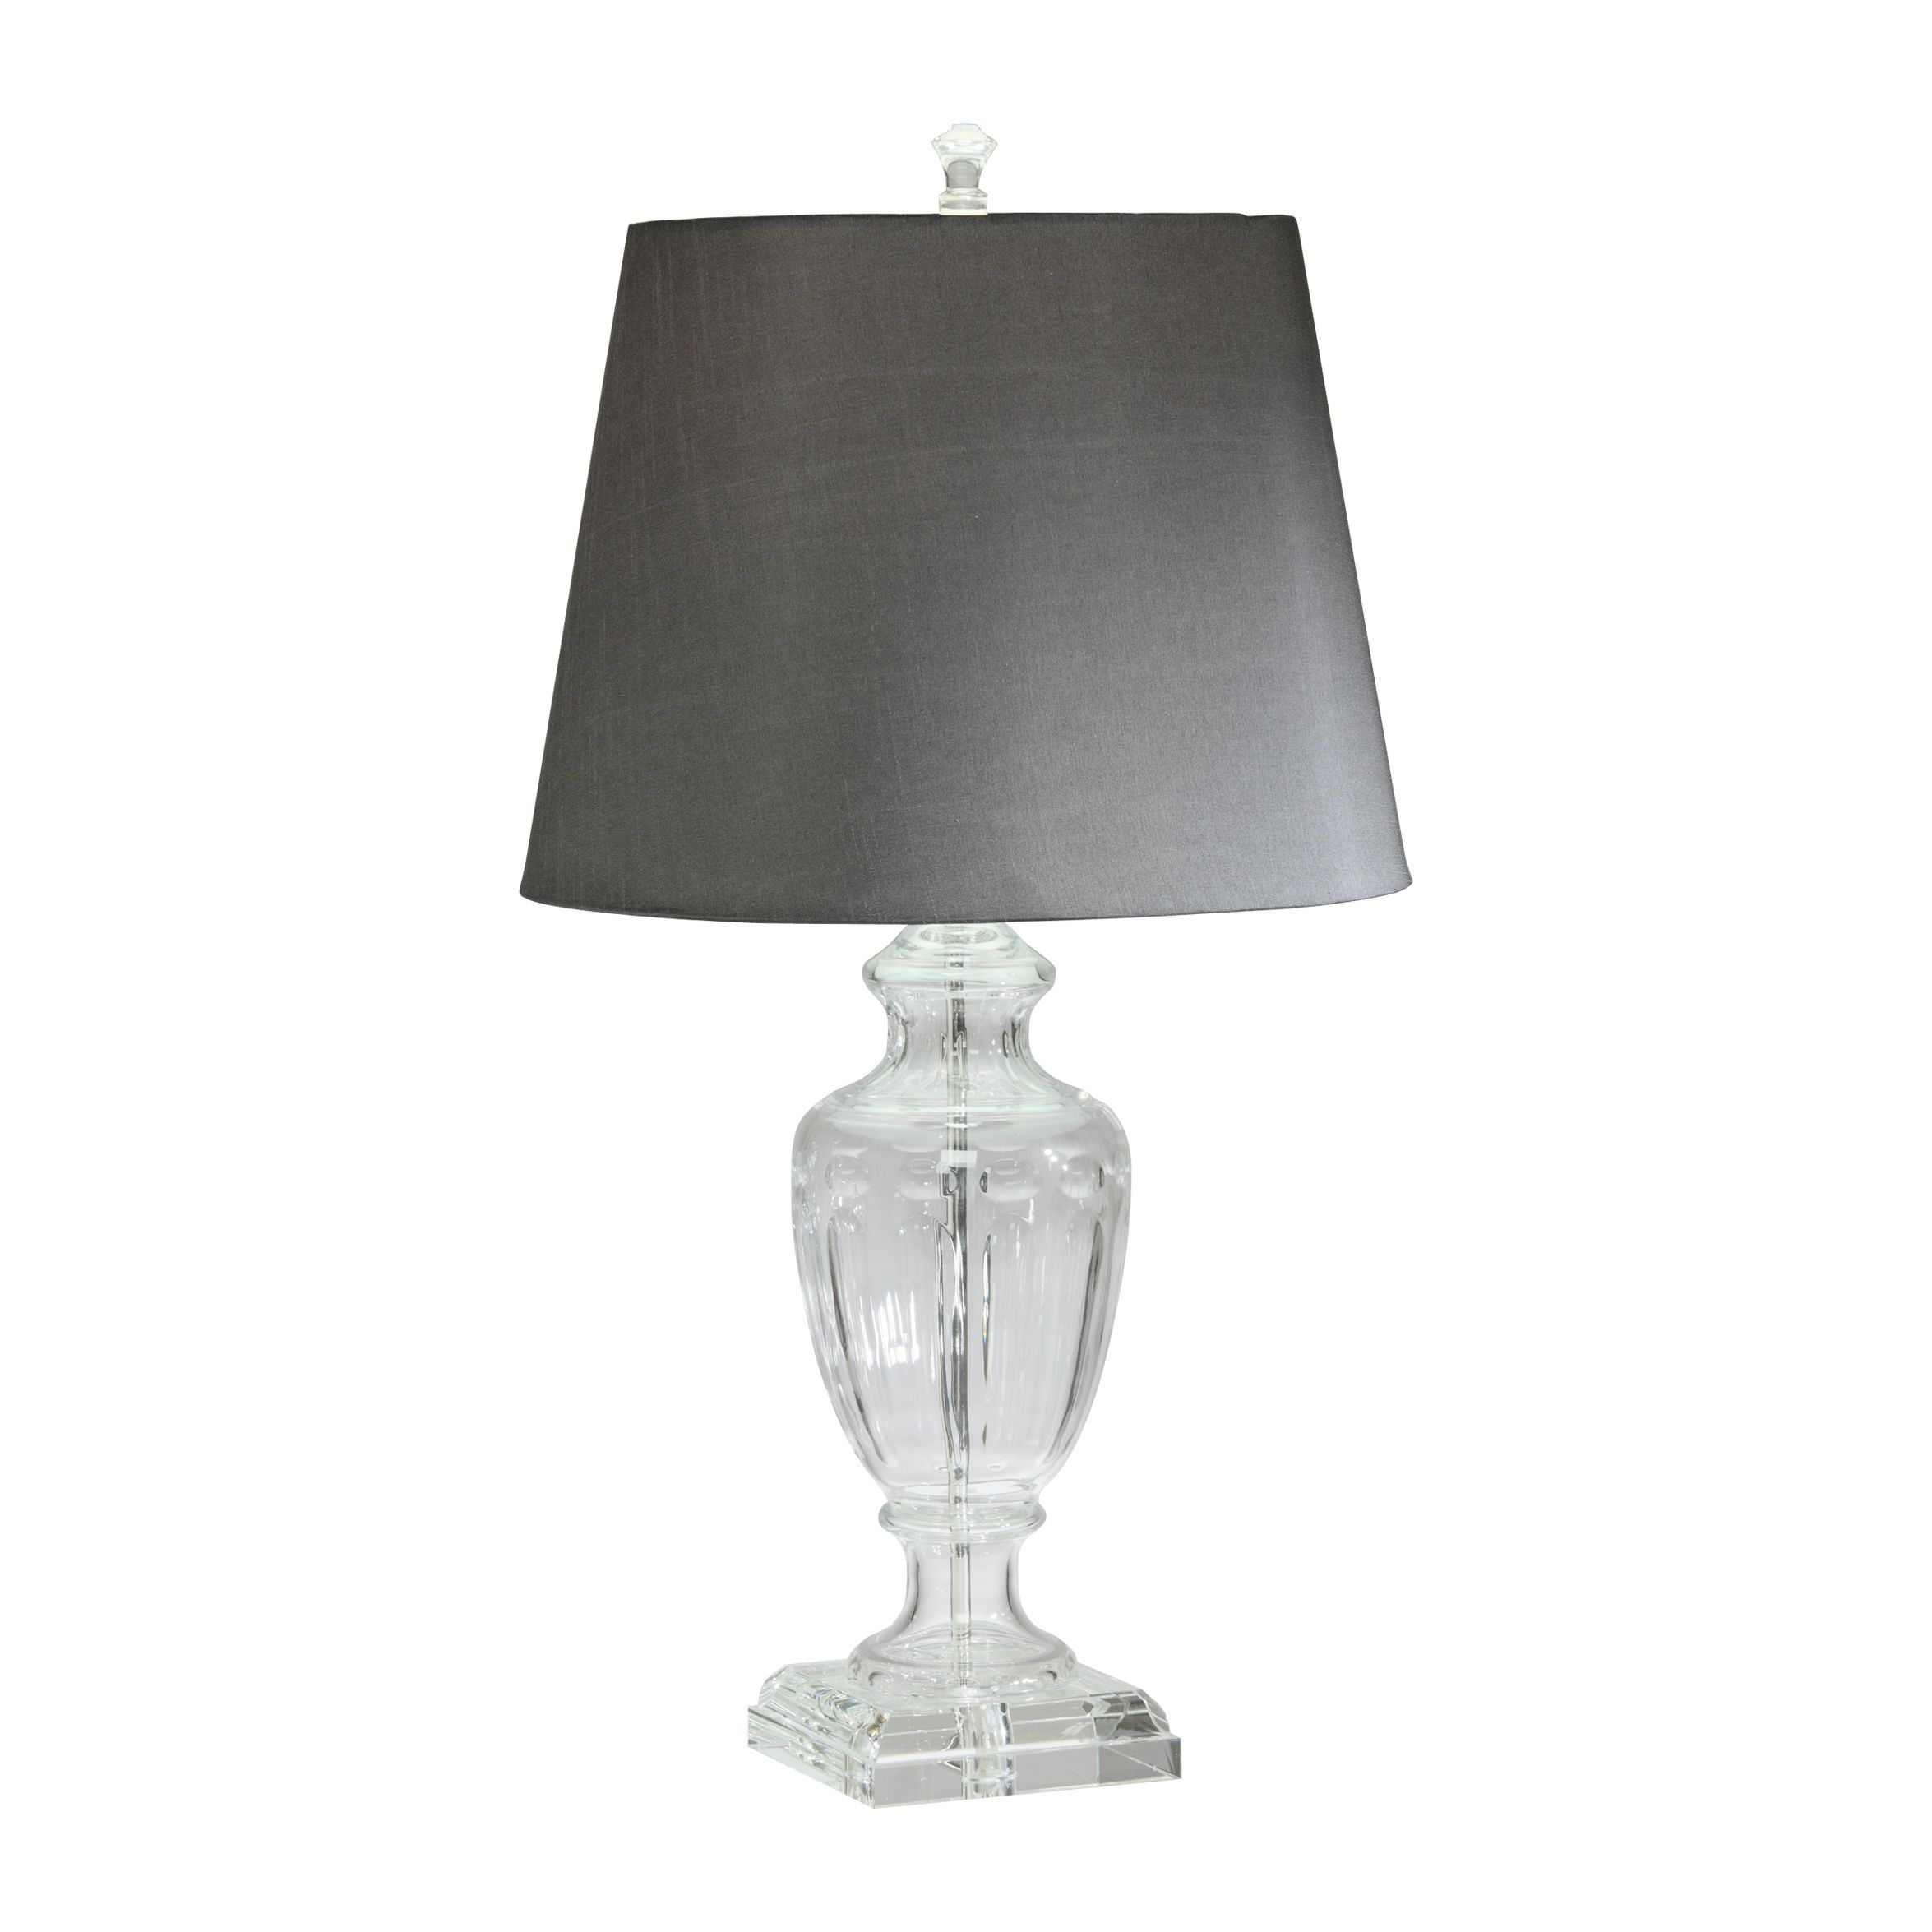 Beekman Crystal Table Lamp   Ethan Allen US. Beekman Crystal Table Lamp   Ethan Allen US   Zandpour Living Room